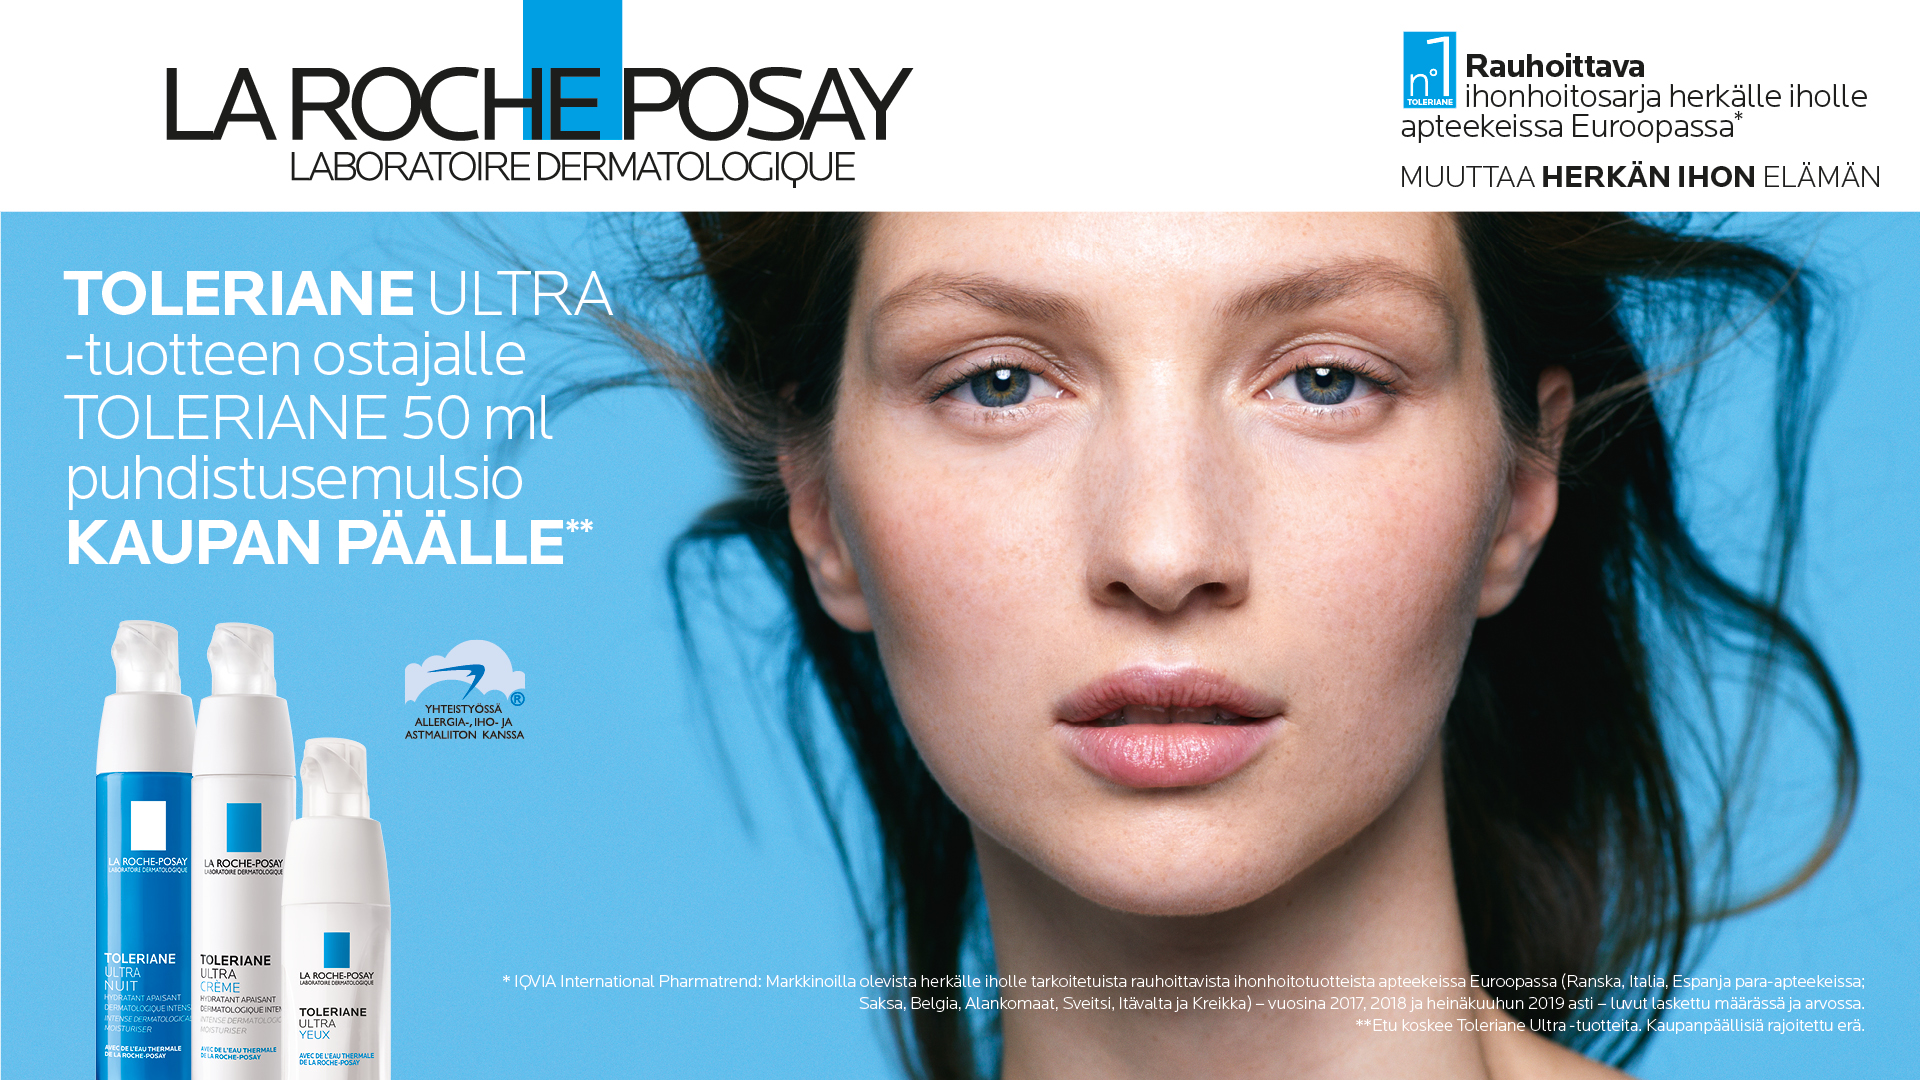 La Roche-Posay Toleriane kampanja